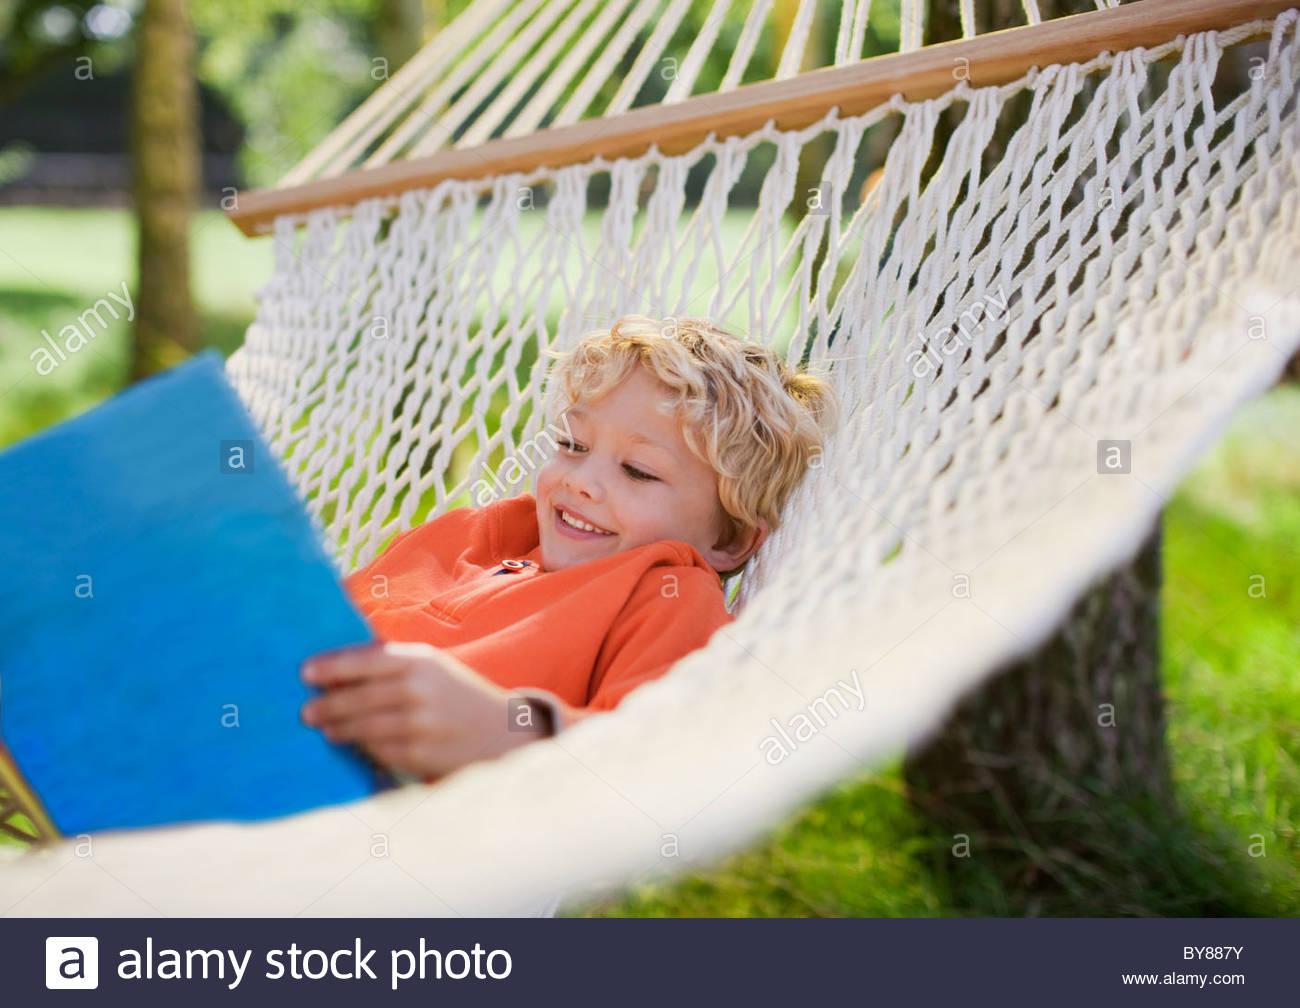 Boy laying in hammock reading book - Stock Image